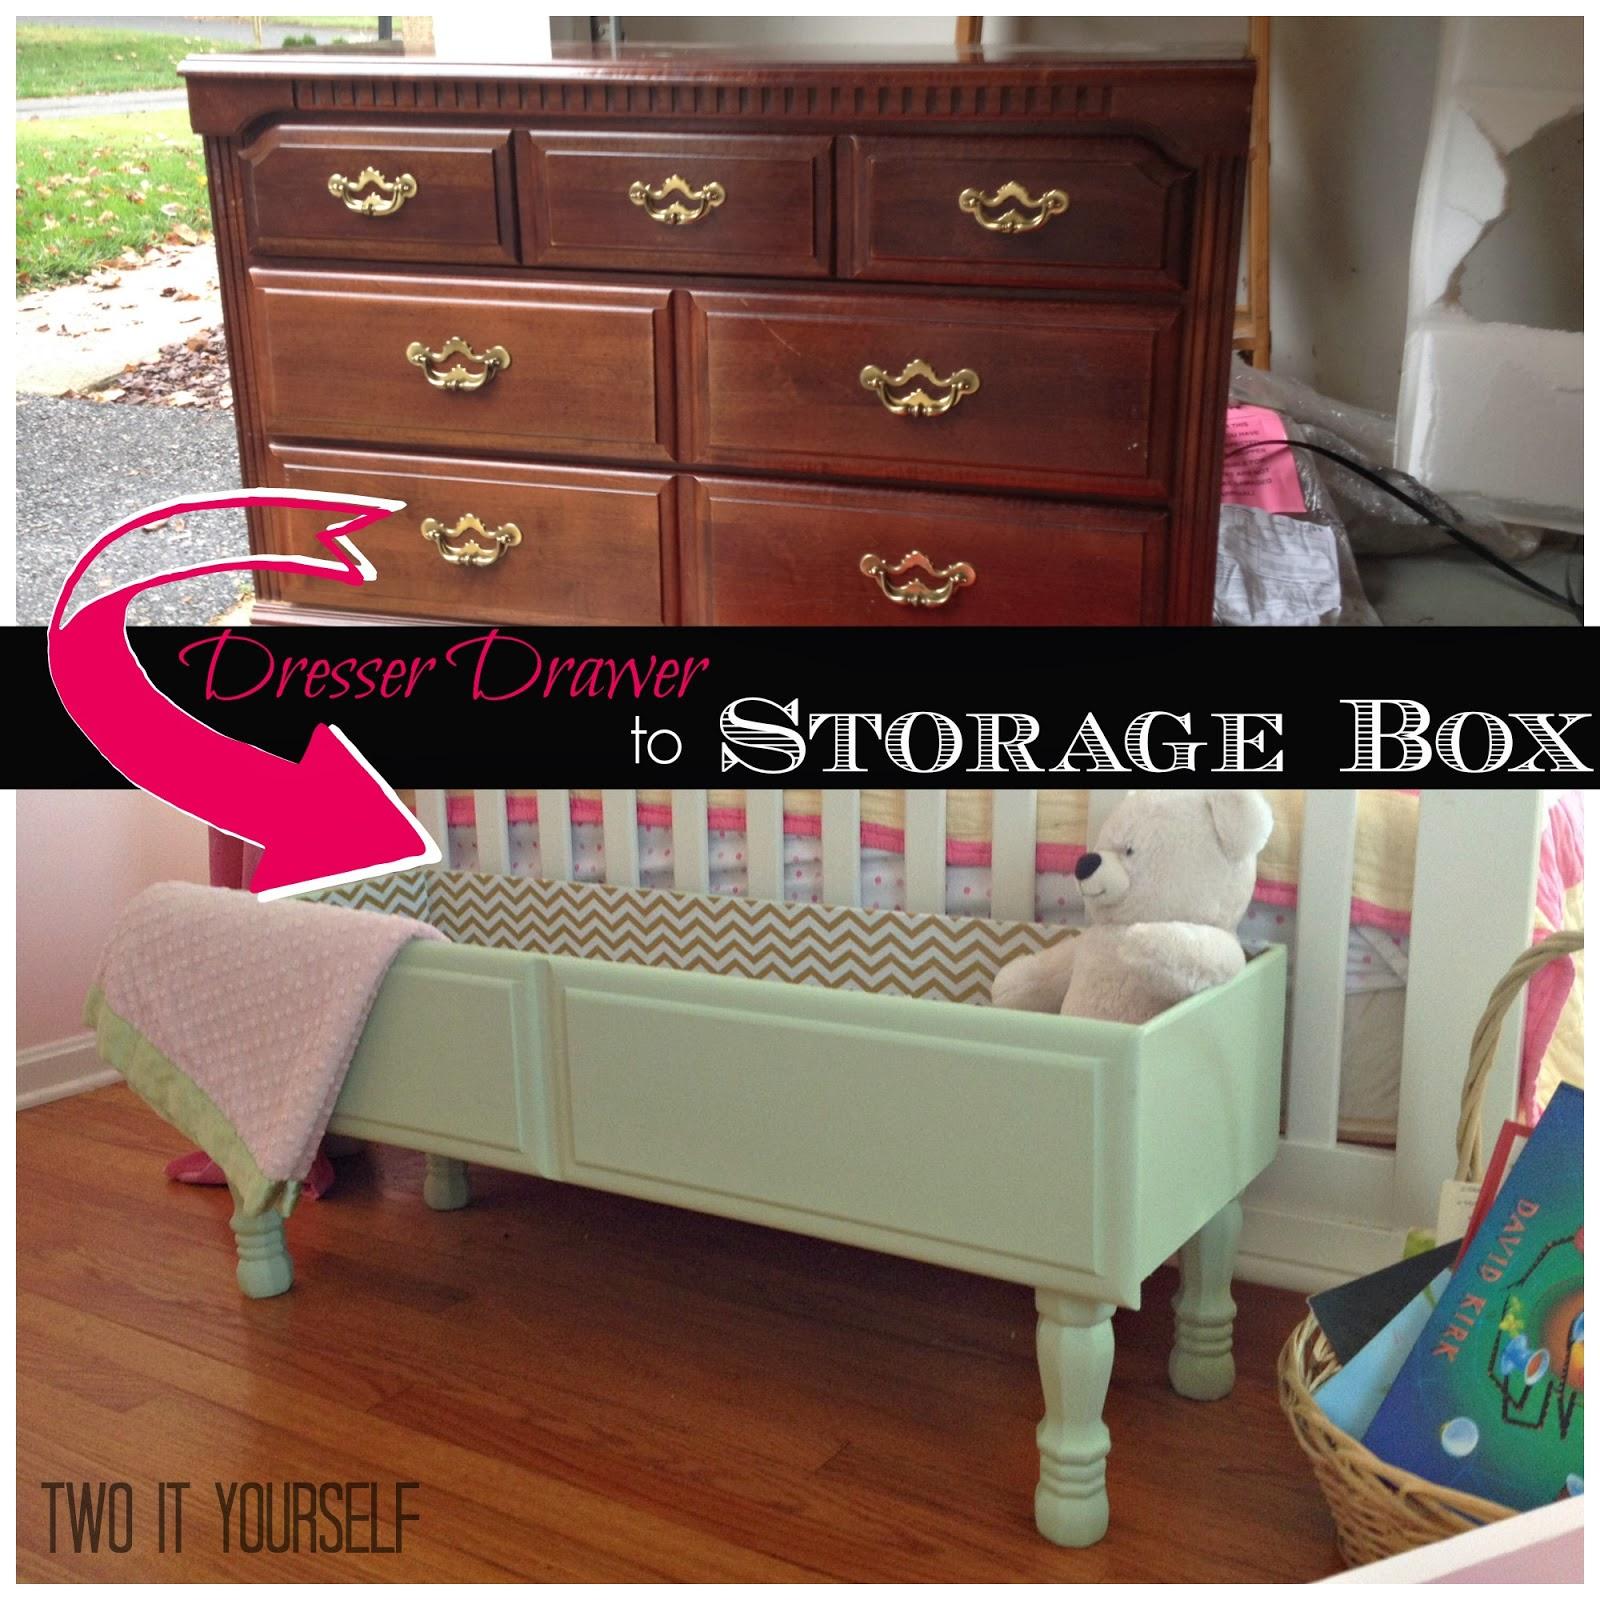 Childrens Animals Storage Box Chest 3 Kids Drawer Bedroom: Two It Yourself: Dresser Drawer To Storage Box {Easy DIY